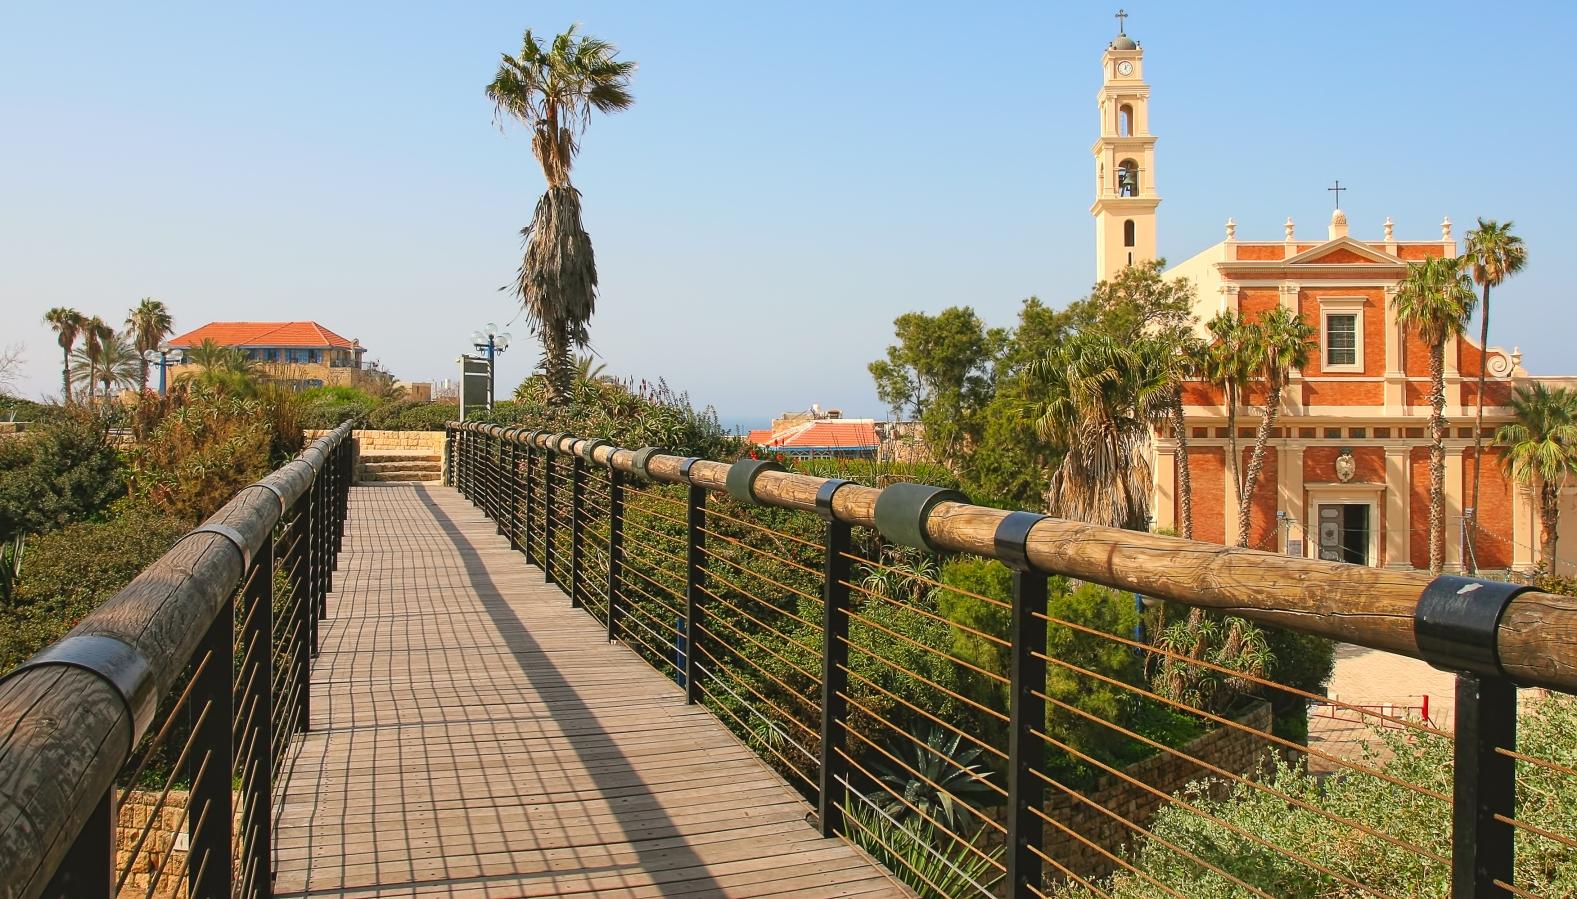 Wishing Bridge in Old Jaffa. Photo by Rostislav Glinsky via Shutterstock.com